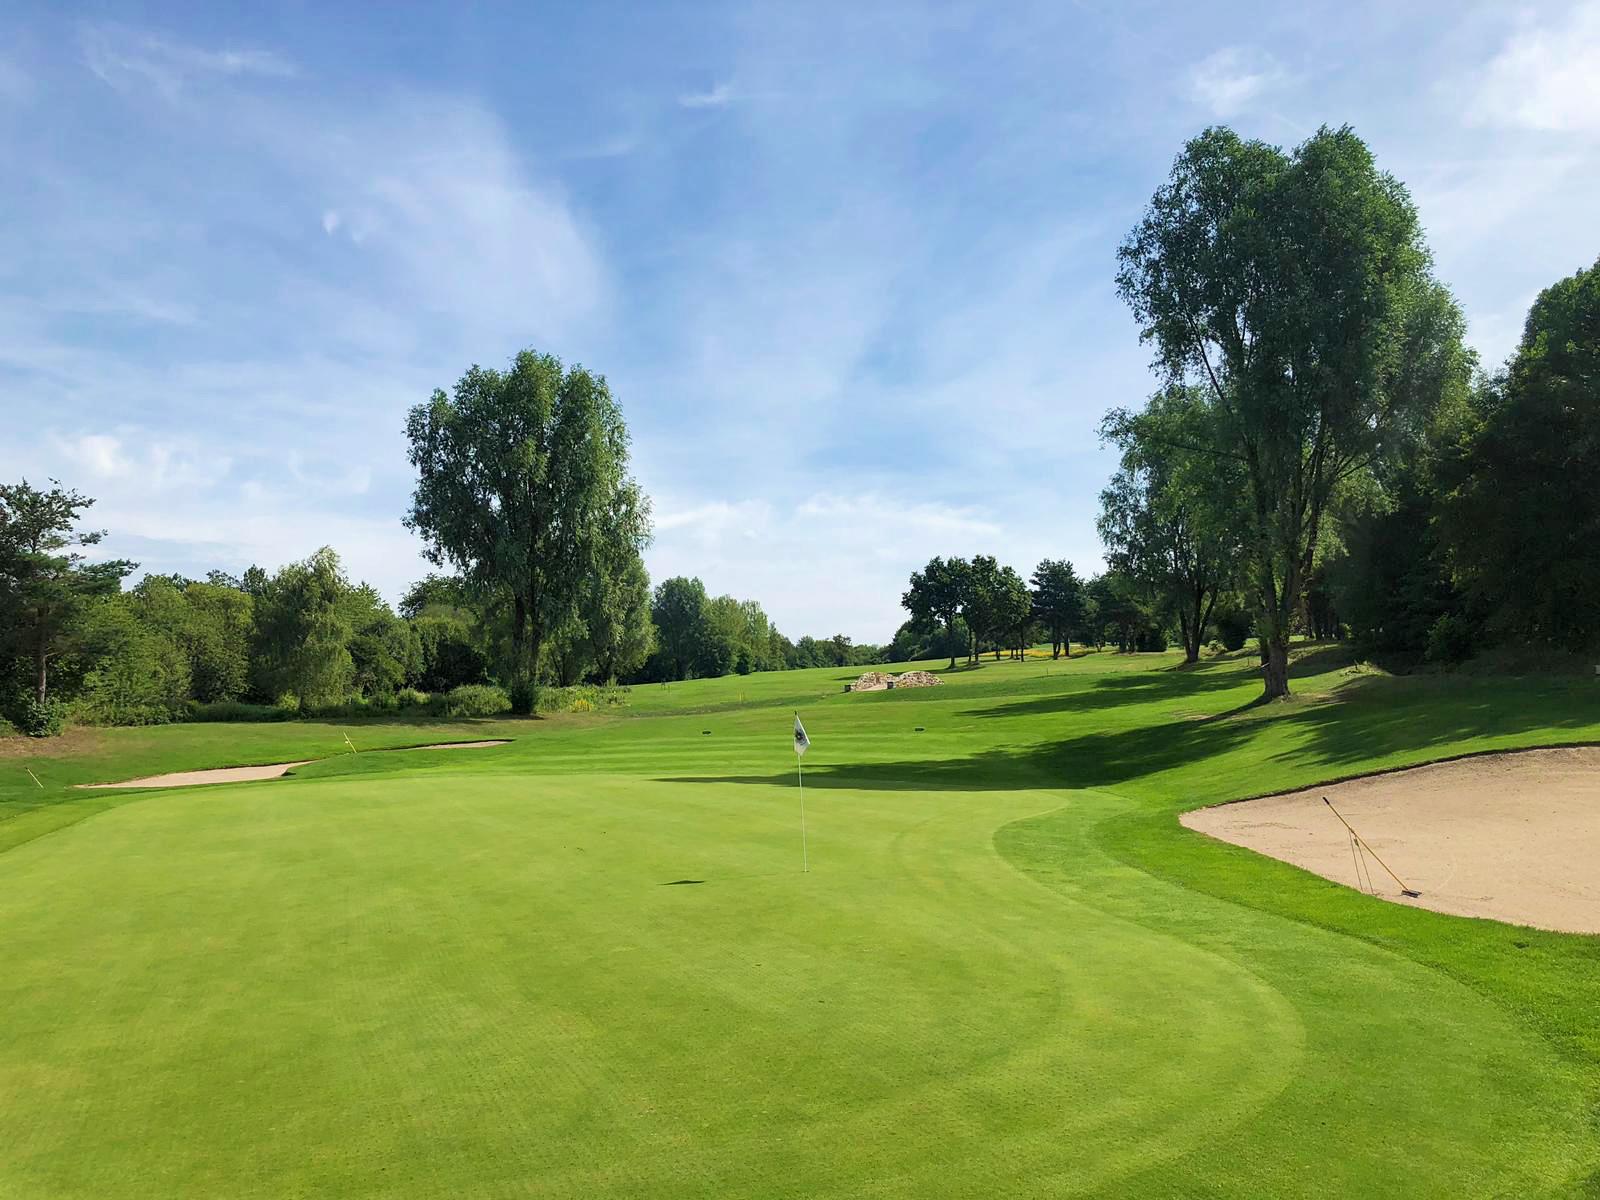 Lindner Hotel & Sporting Club Wiesensee / Golfclub Wiesensee e.V.